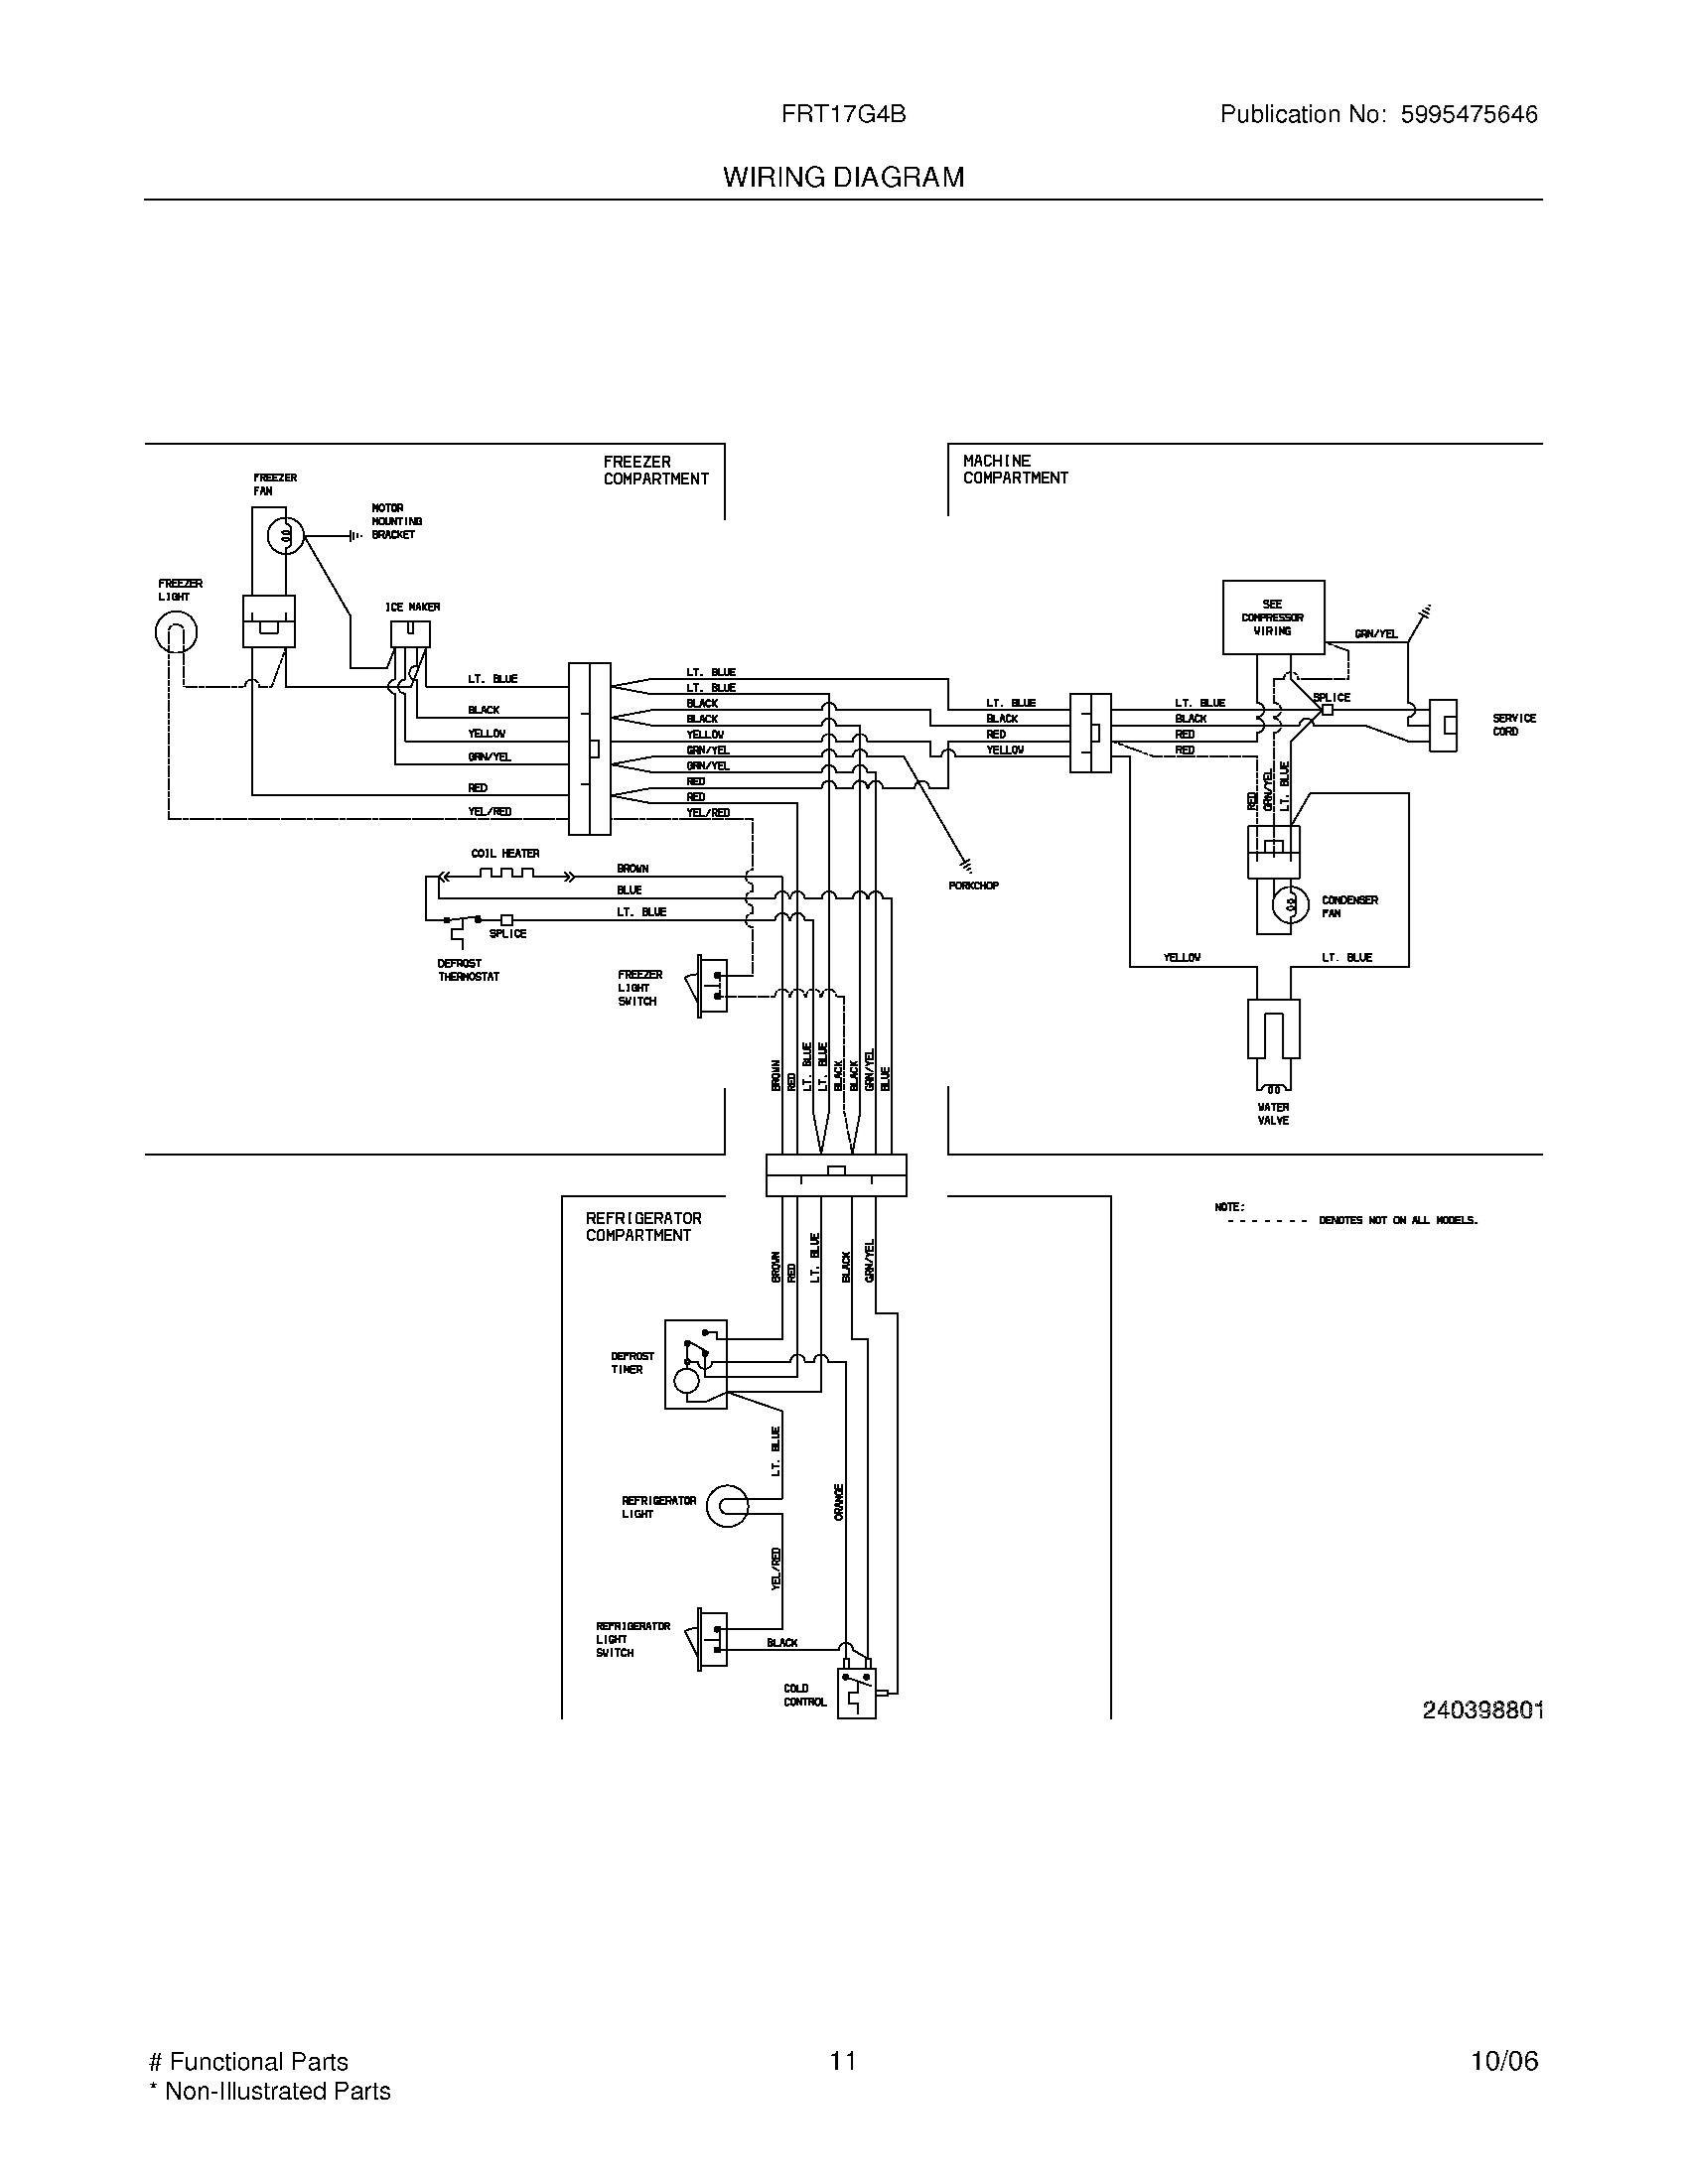 Frigidaire Chest Freezer Wiring Diagram Dolgularcomdesign